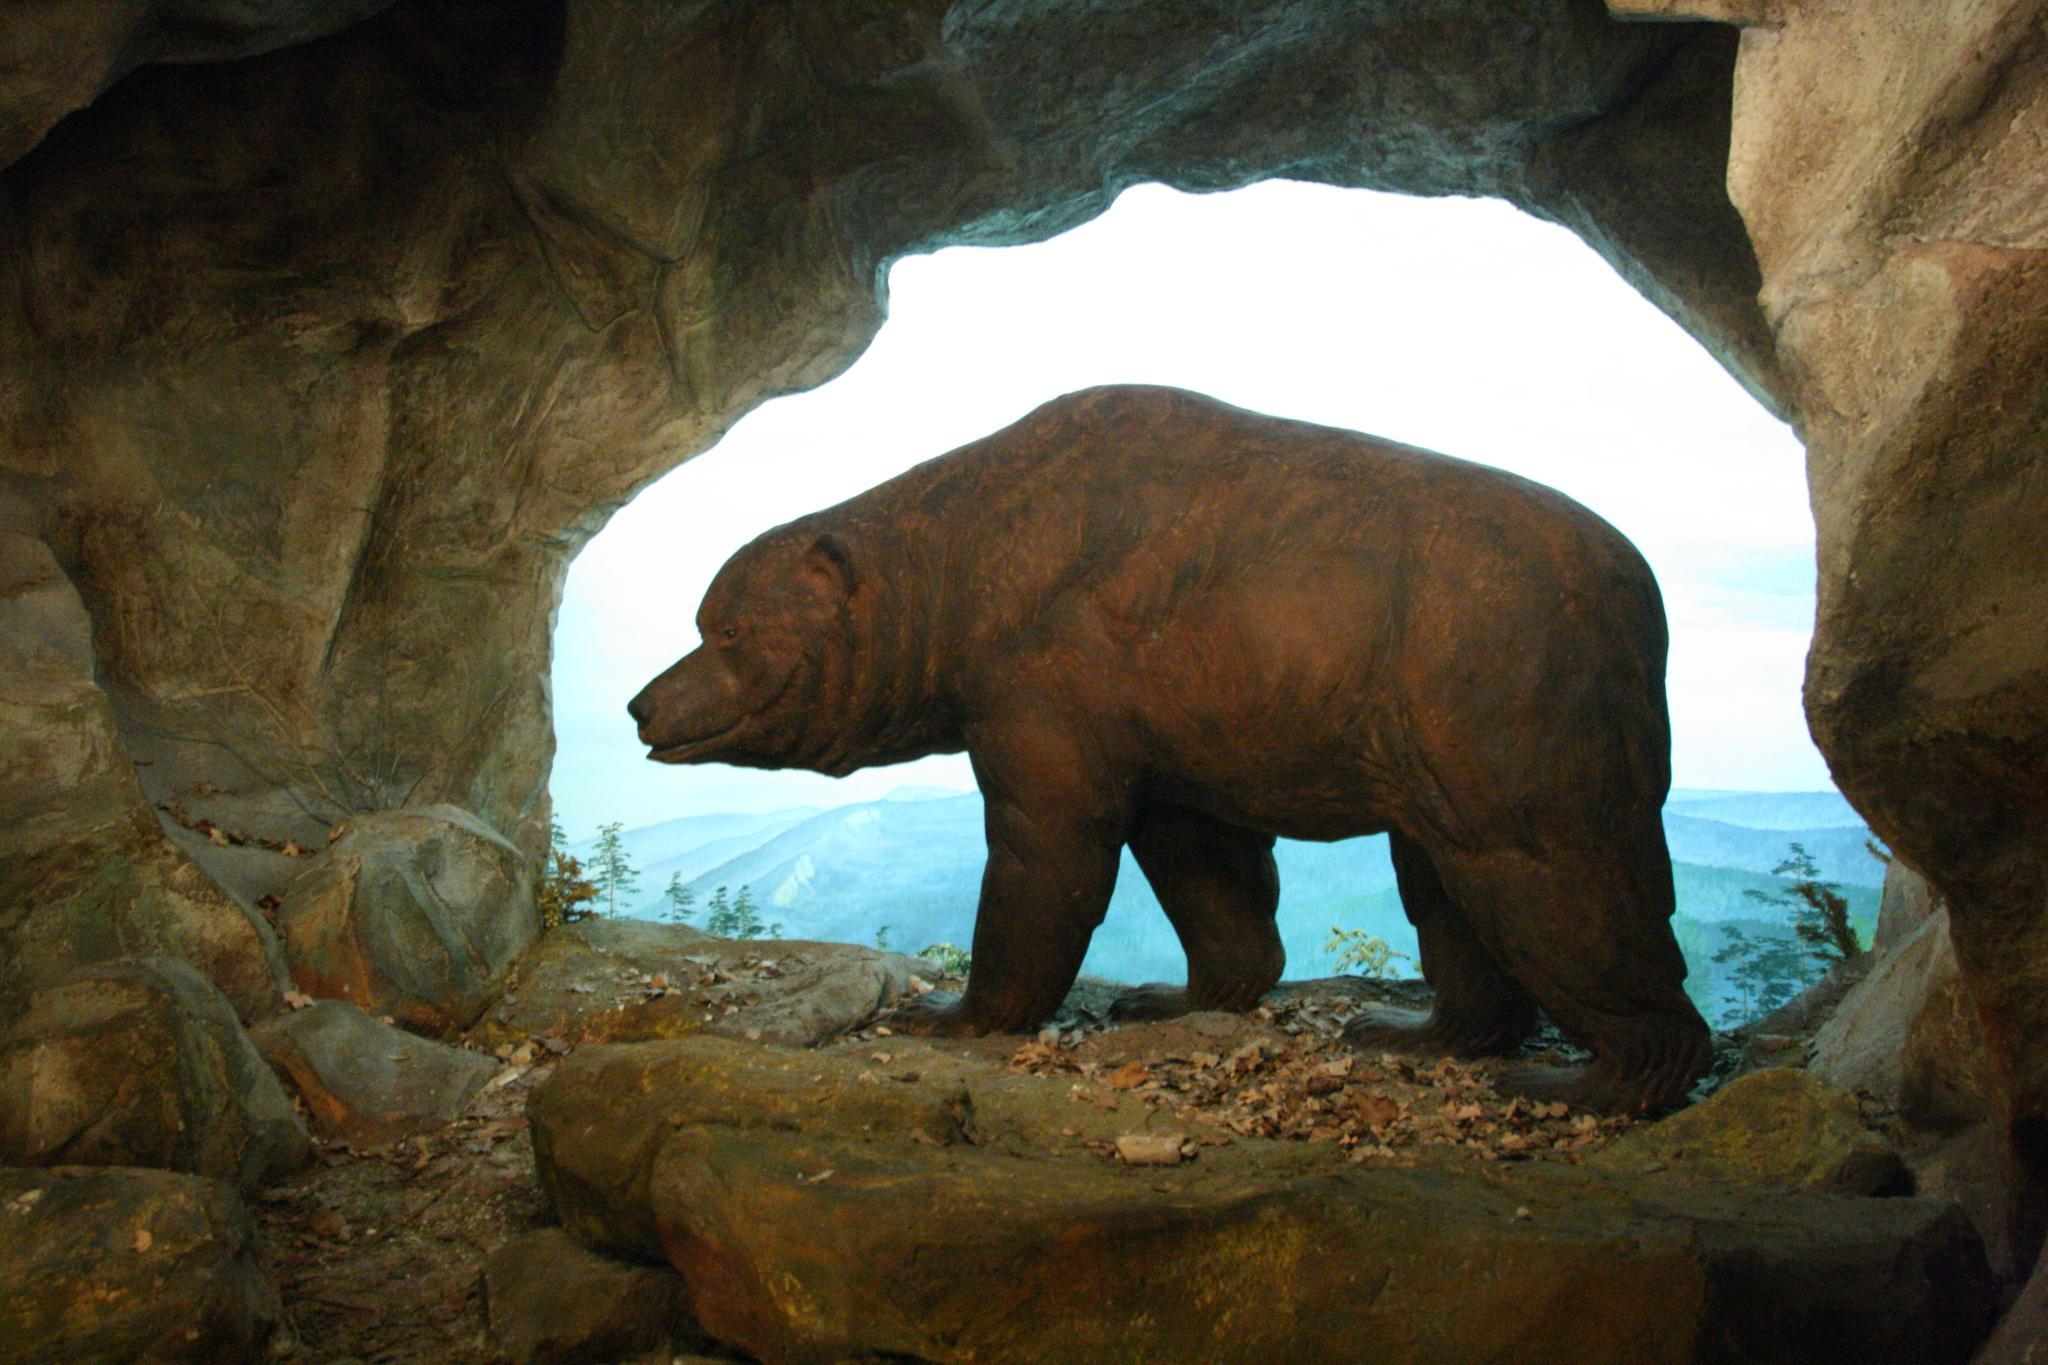 l ours des cavernes victime d un r gime v g tarien trop exclusif le temps. Black Bedroom Furniture Sets. Home Design Ideas